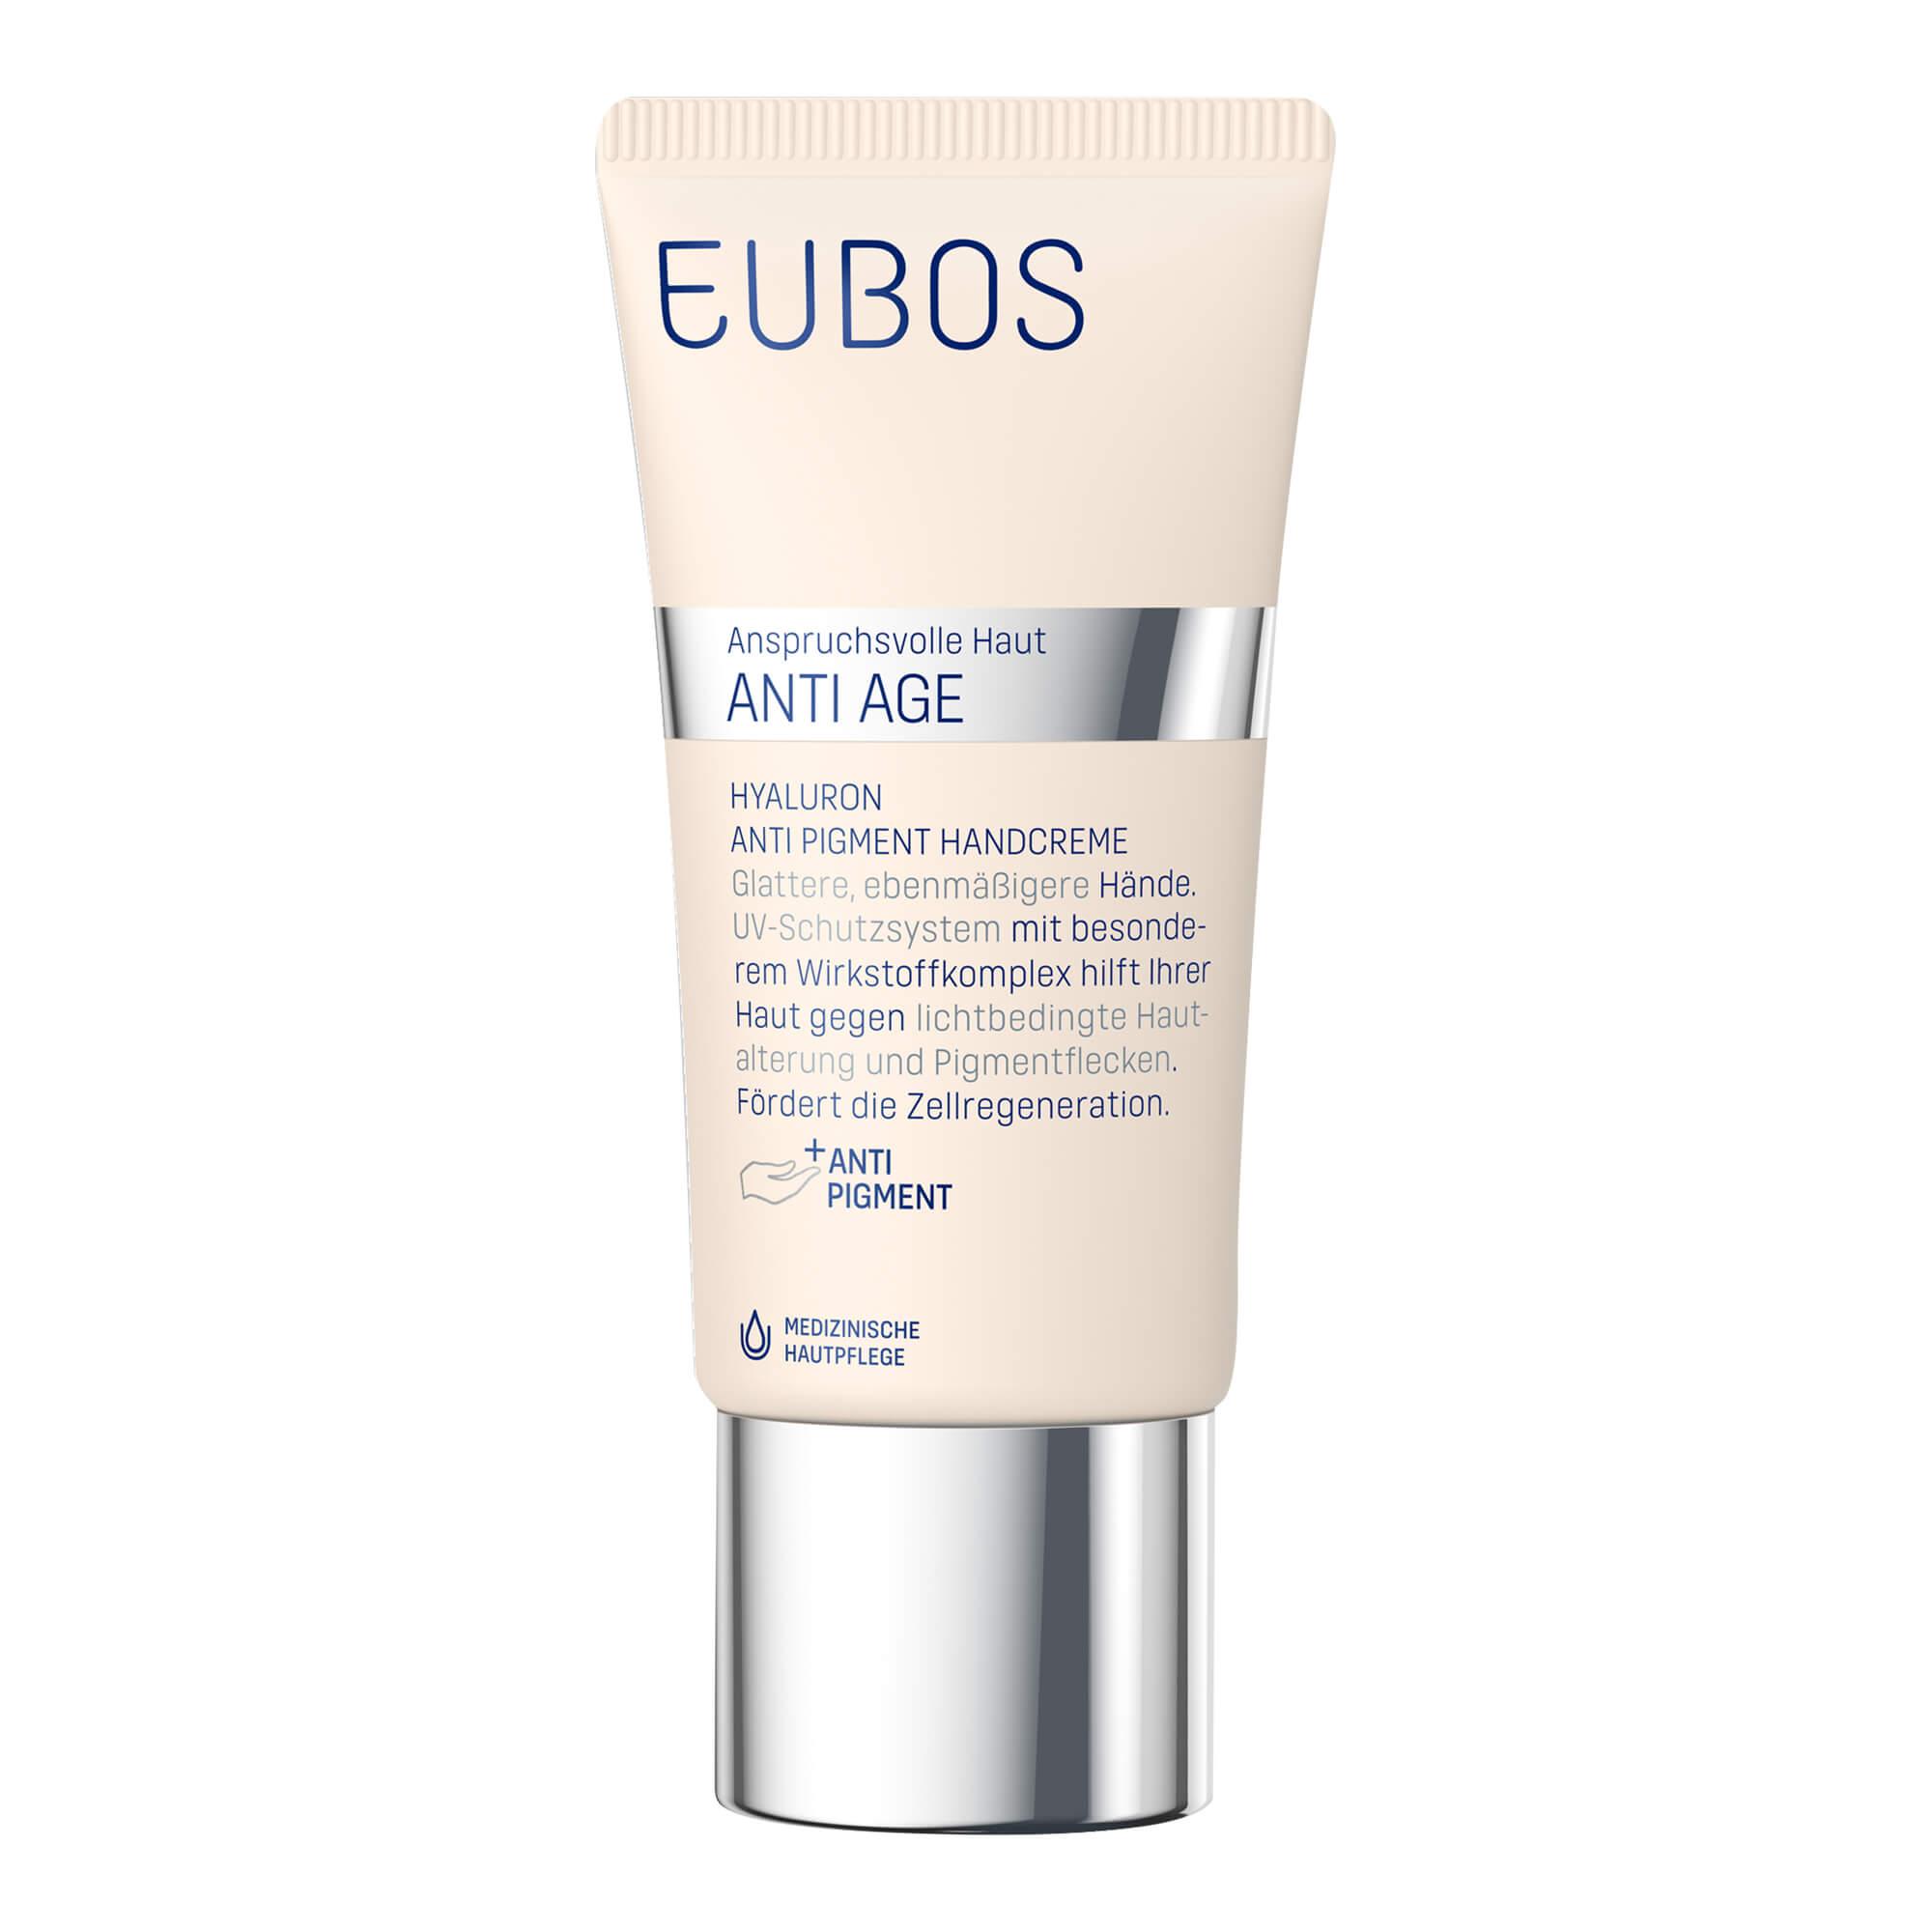 Eubos ANTI AGE Hyaluron Anti Pigment Handcreme LSF 15